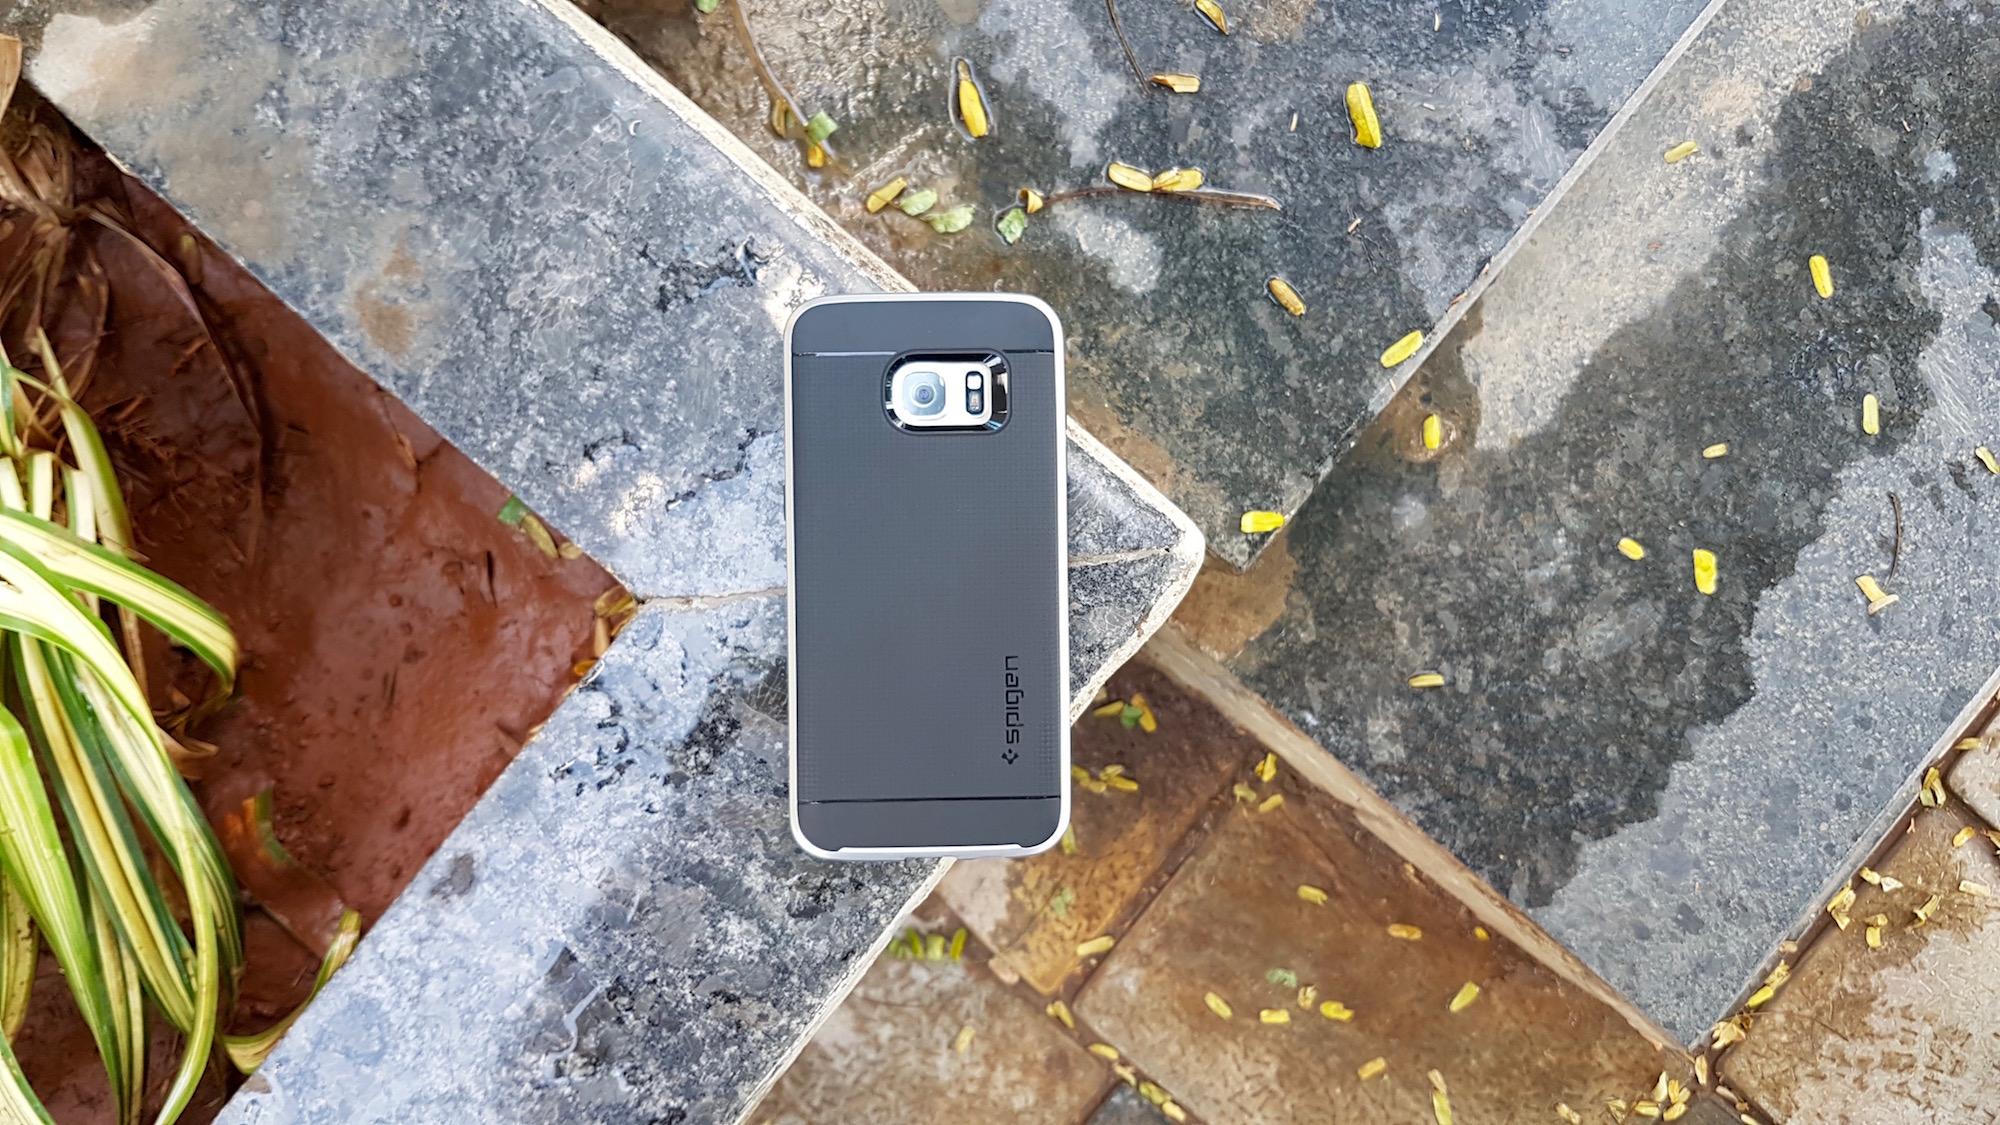 Spigen Neo Hybrid Case For Samsung Galaxy S7 Edge Review - 05